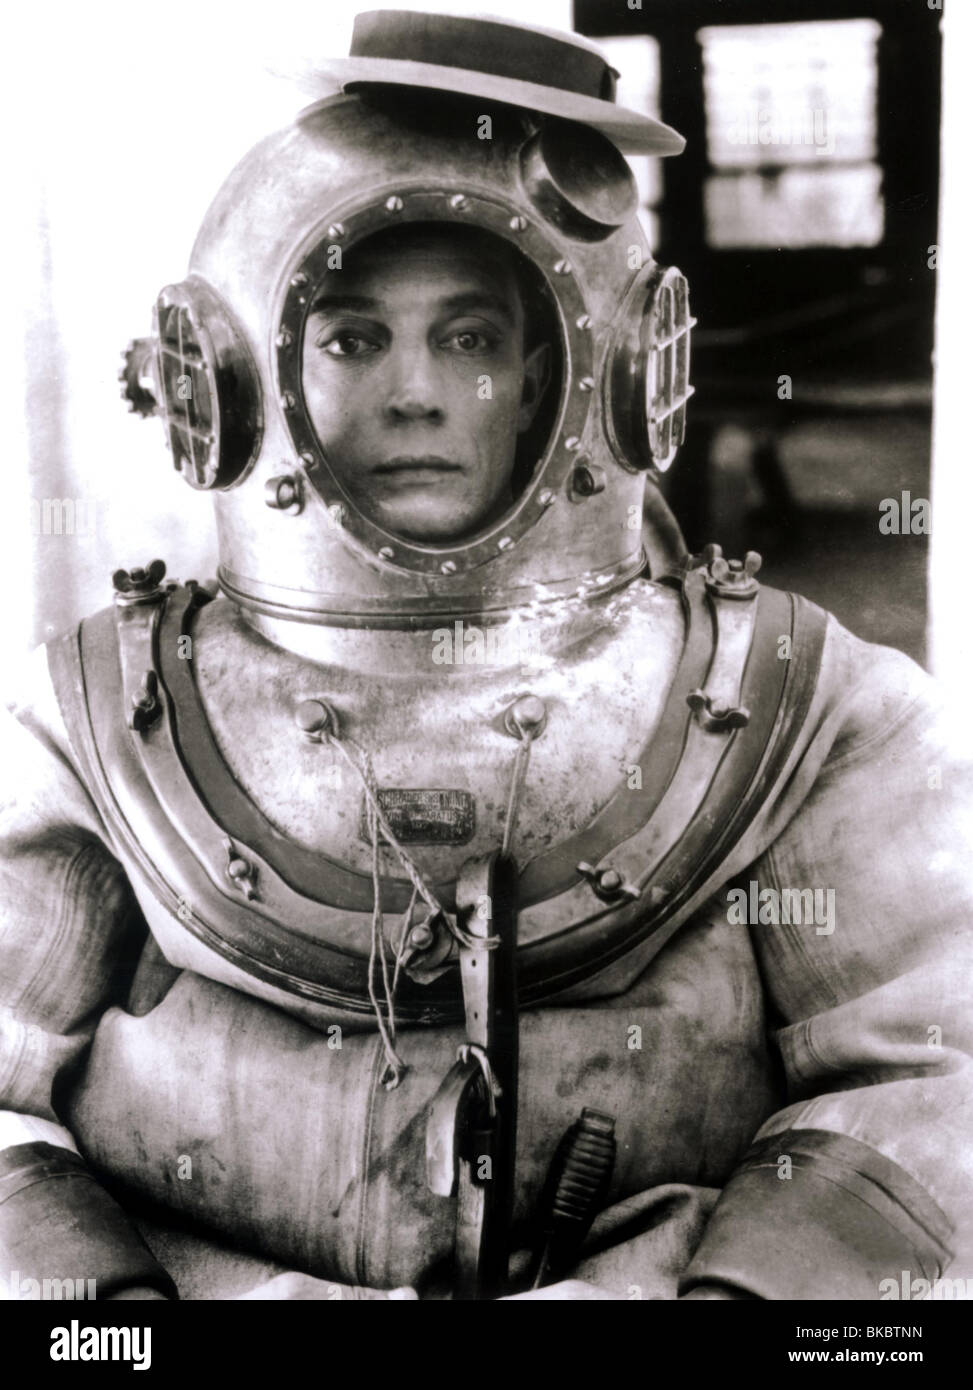 THE NAVIGATOR (1924) BUSTER KEATON NAVG 002P - Stock Image